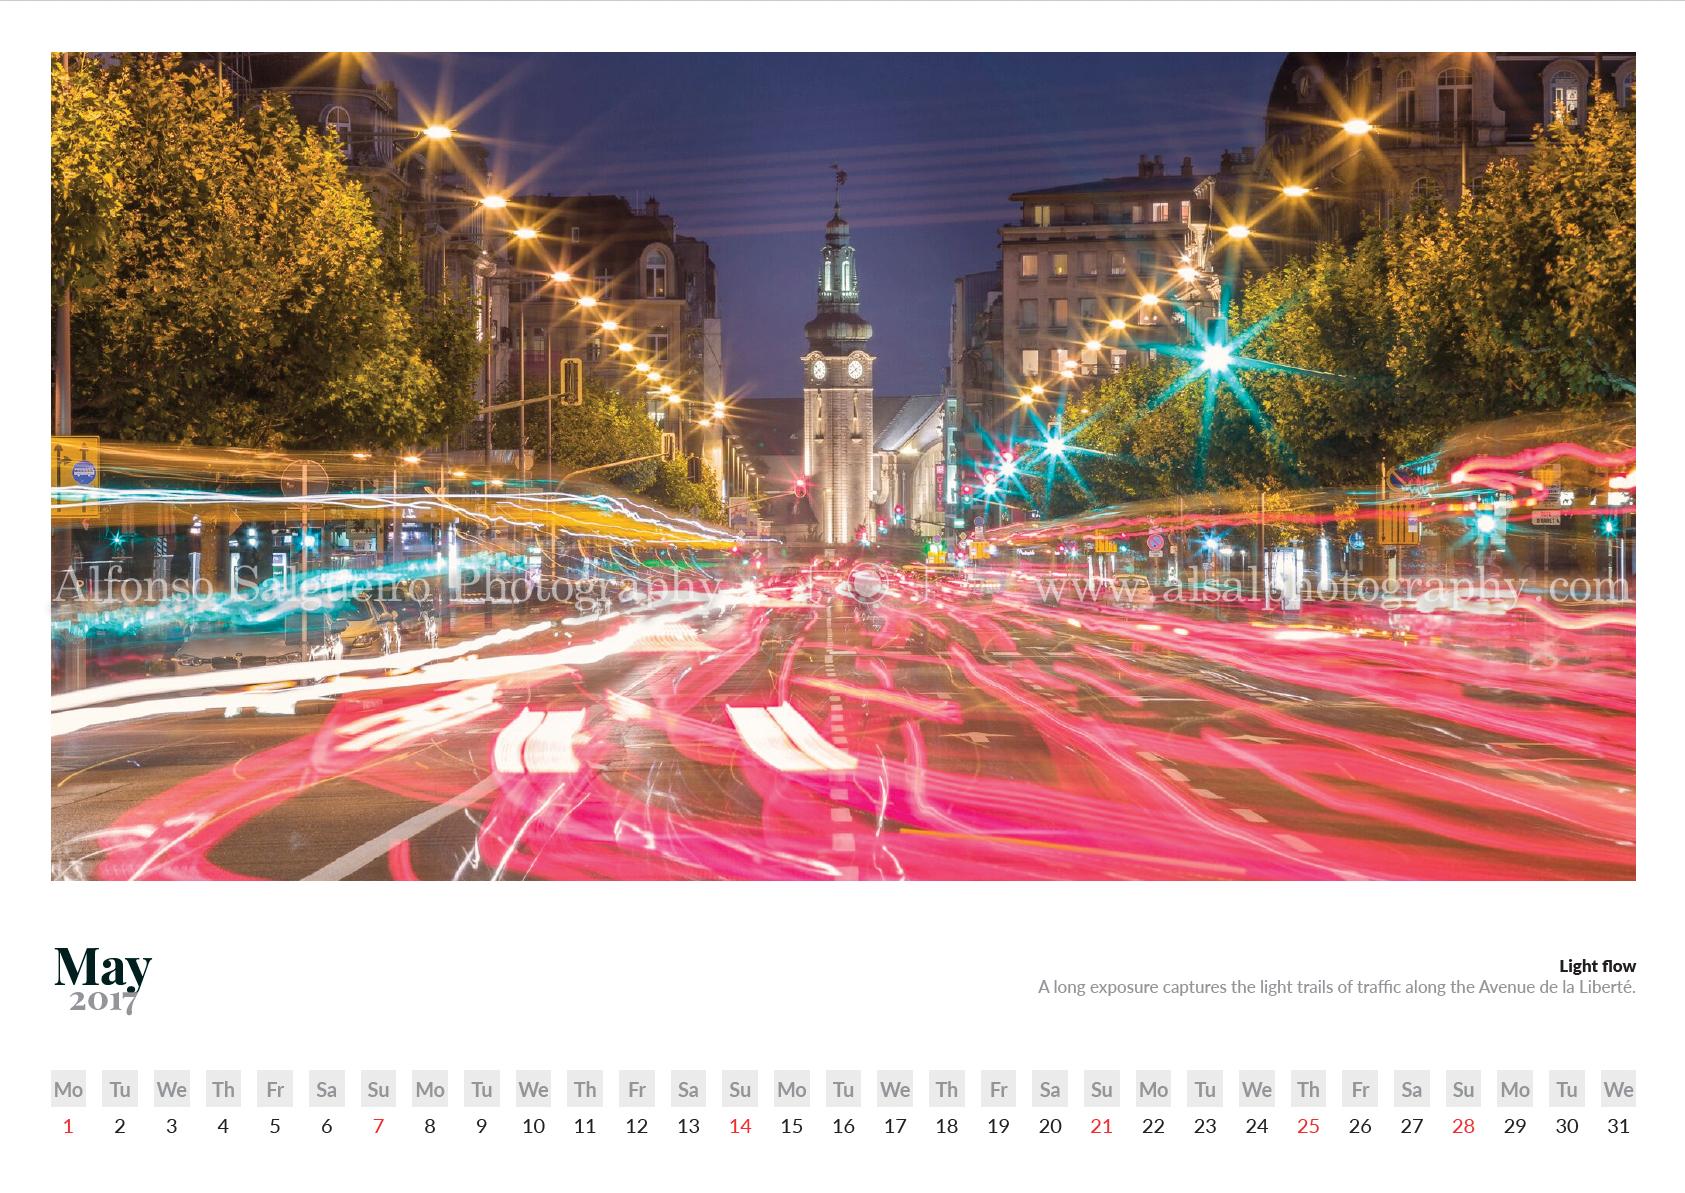 Luxembourg 2017 calendar-6.jpg